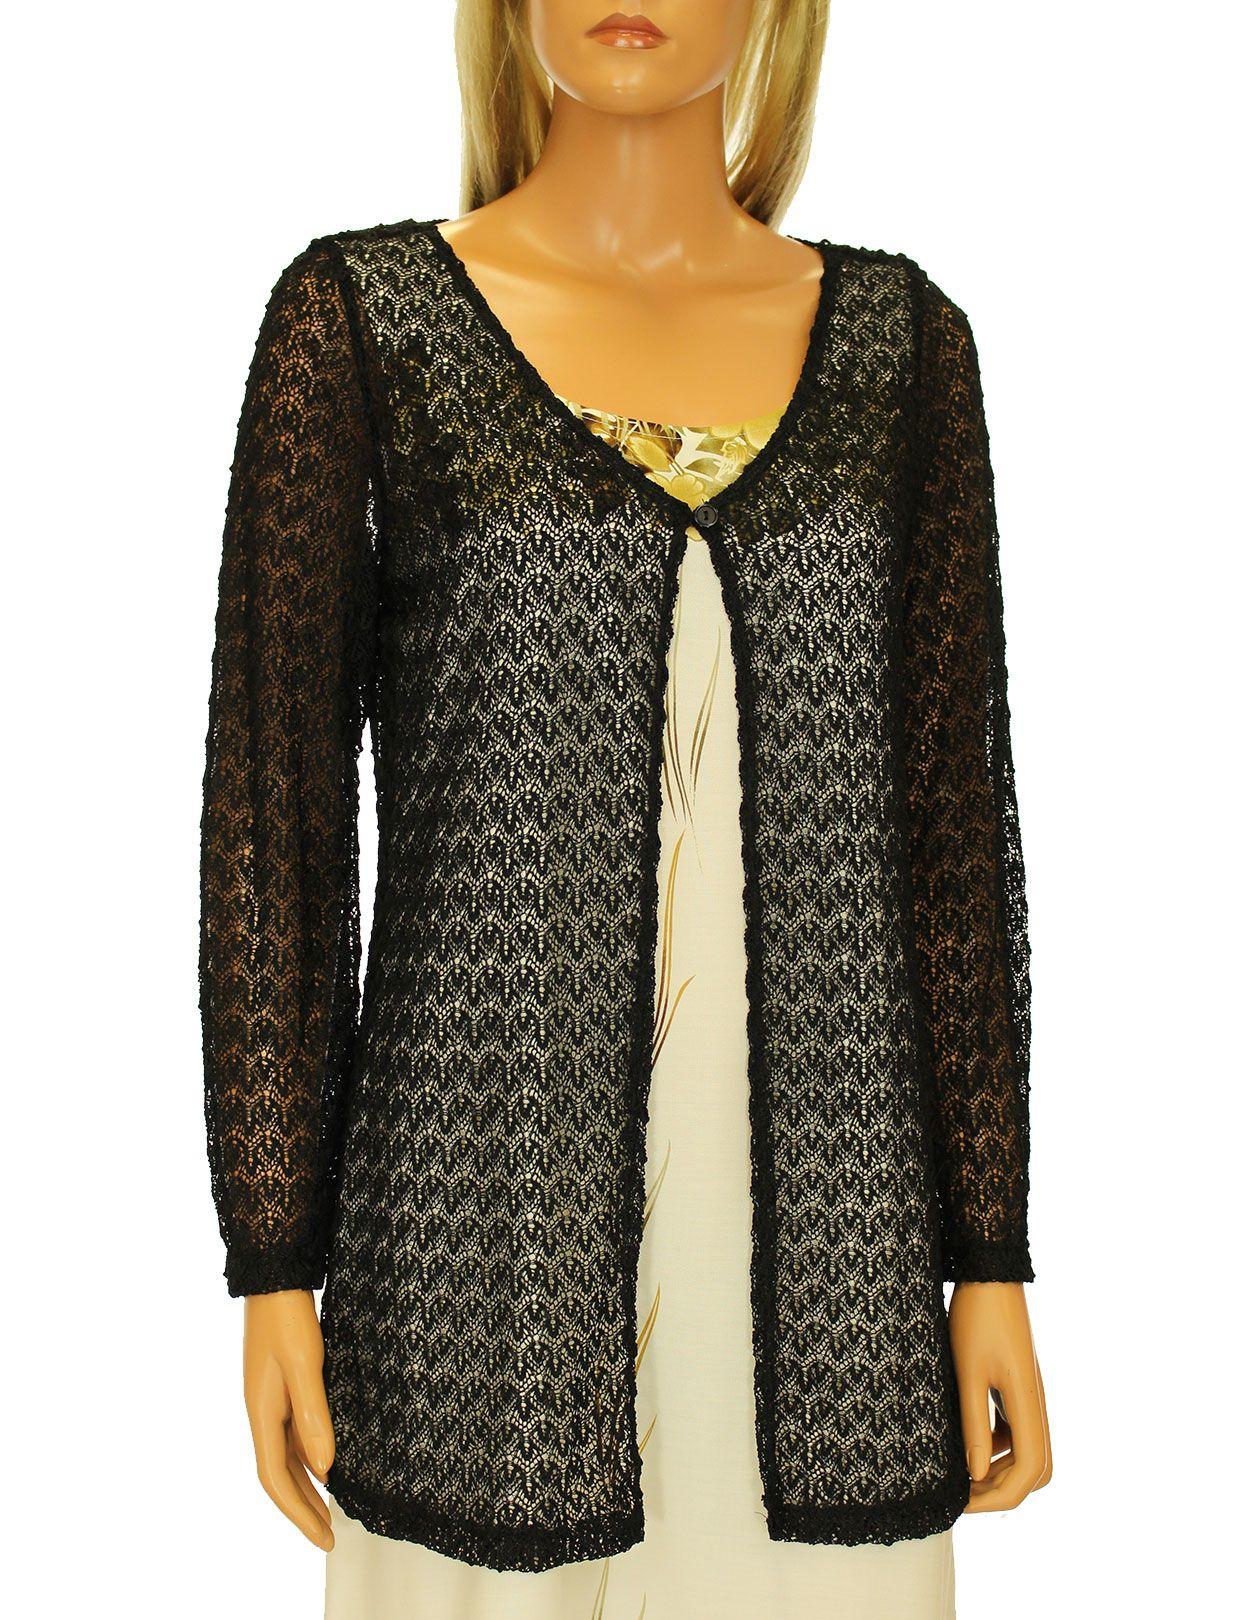 Check out the deal on Long Sleeves Black Crochet Bolero Cardigan at Shaka Time Hawaii Clothing Store Free Shipping from Hawaii #cardigan #hawaiianclothes #womensclothes #aloha